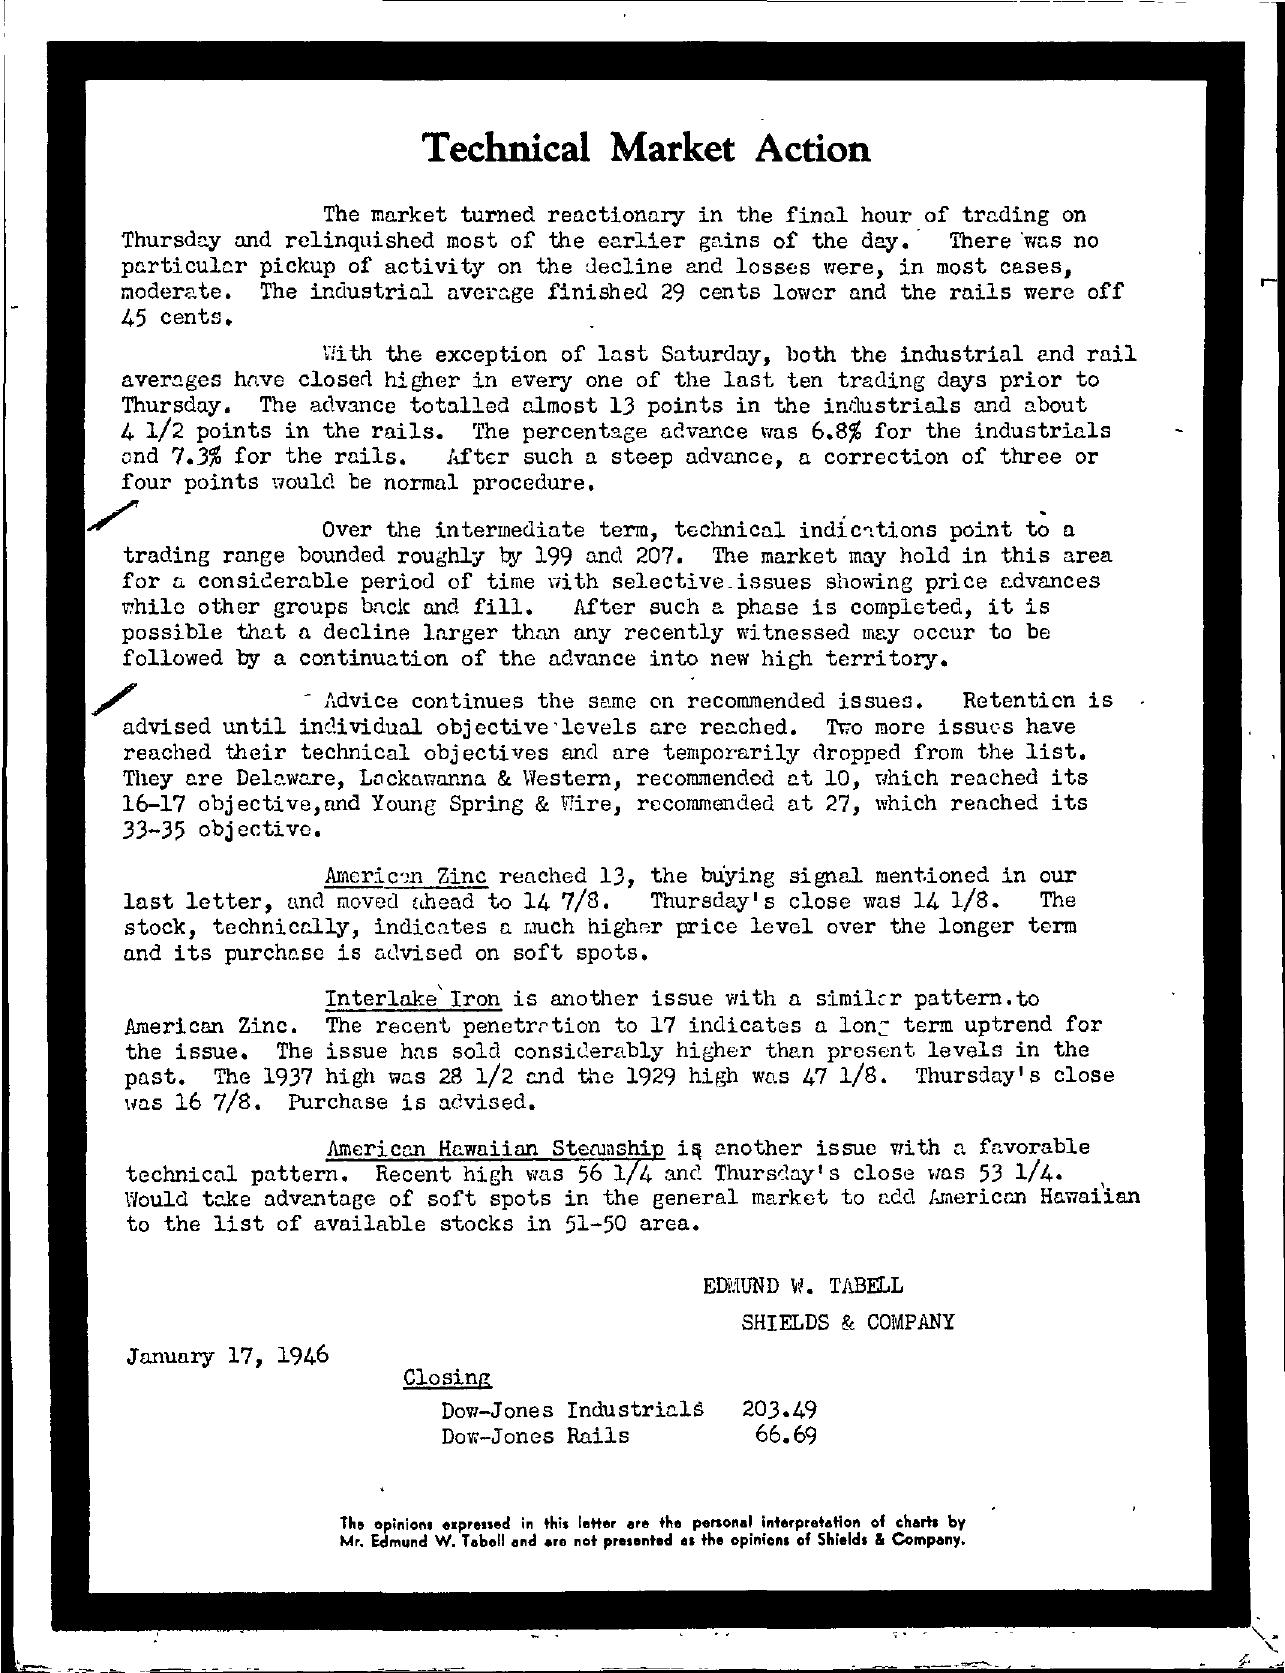 Tabell's Market Letter - January 17, 1946